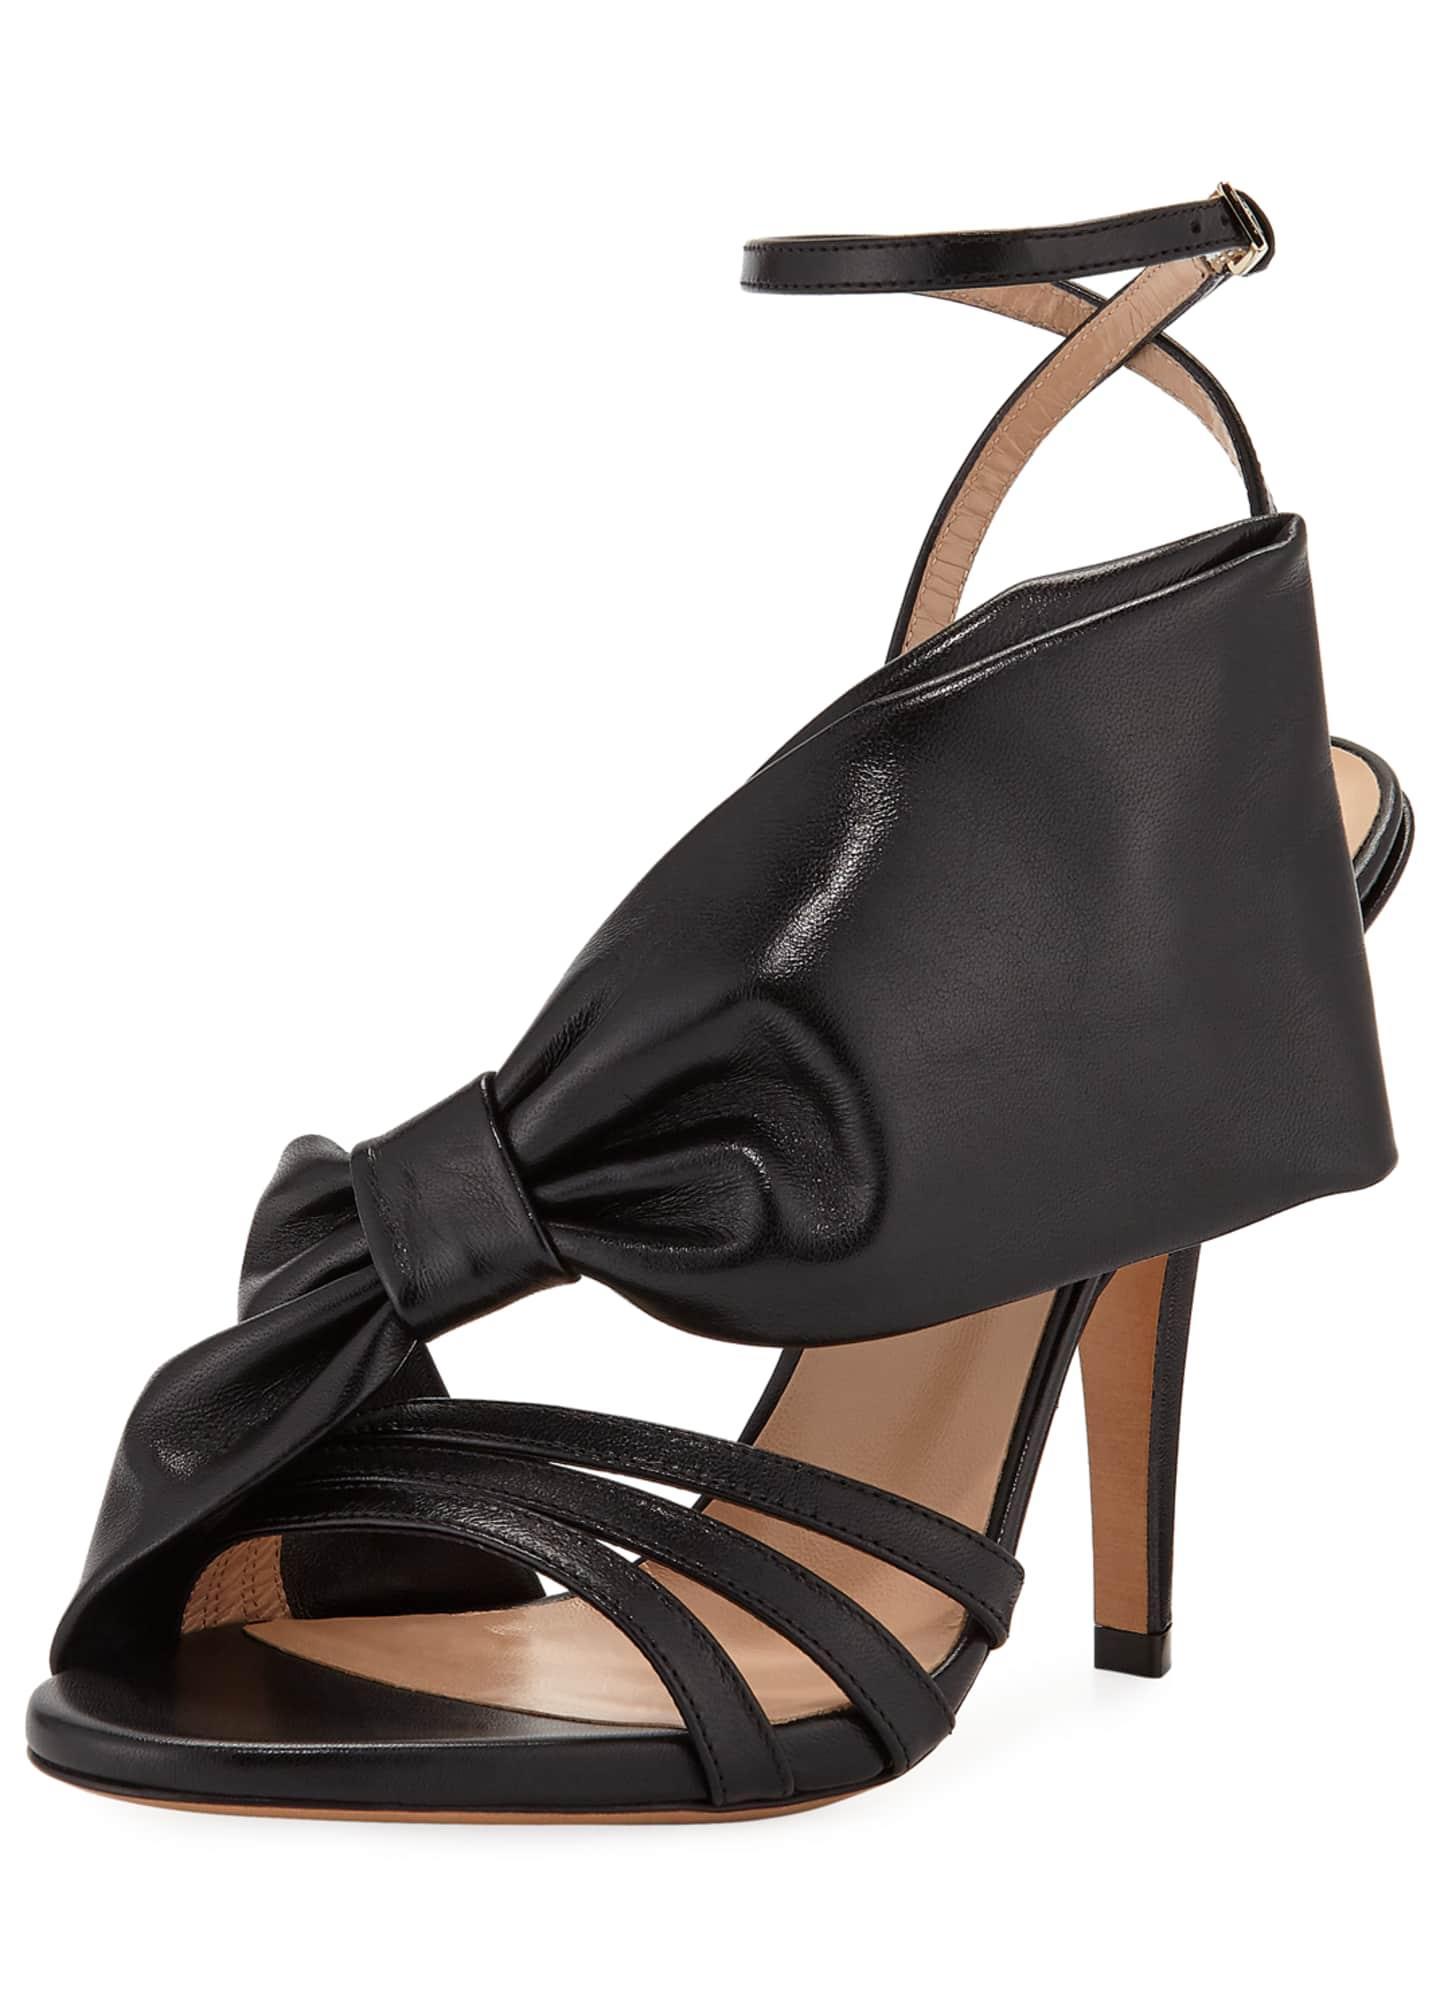 Valentino Garavani Large Bow Leather Sandal